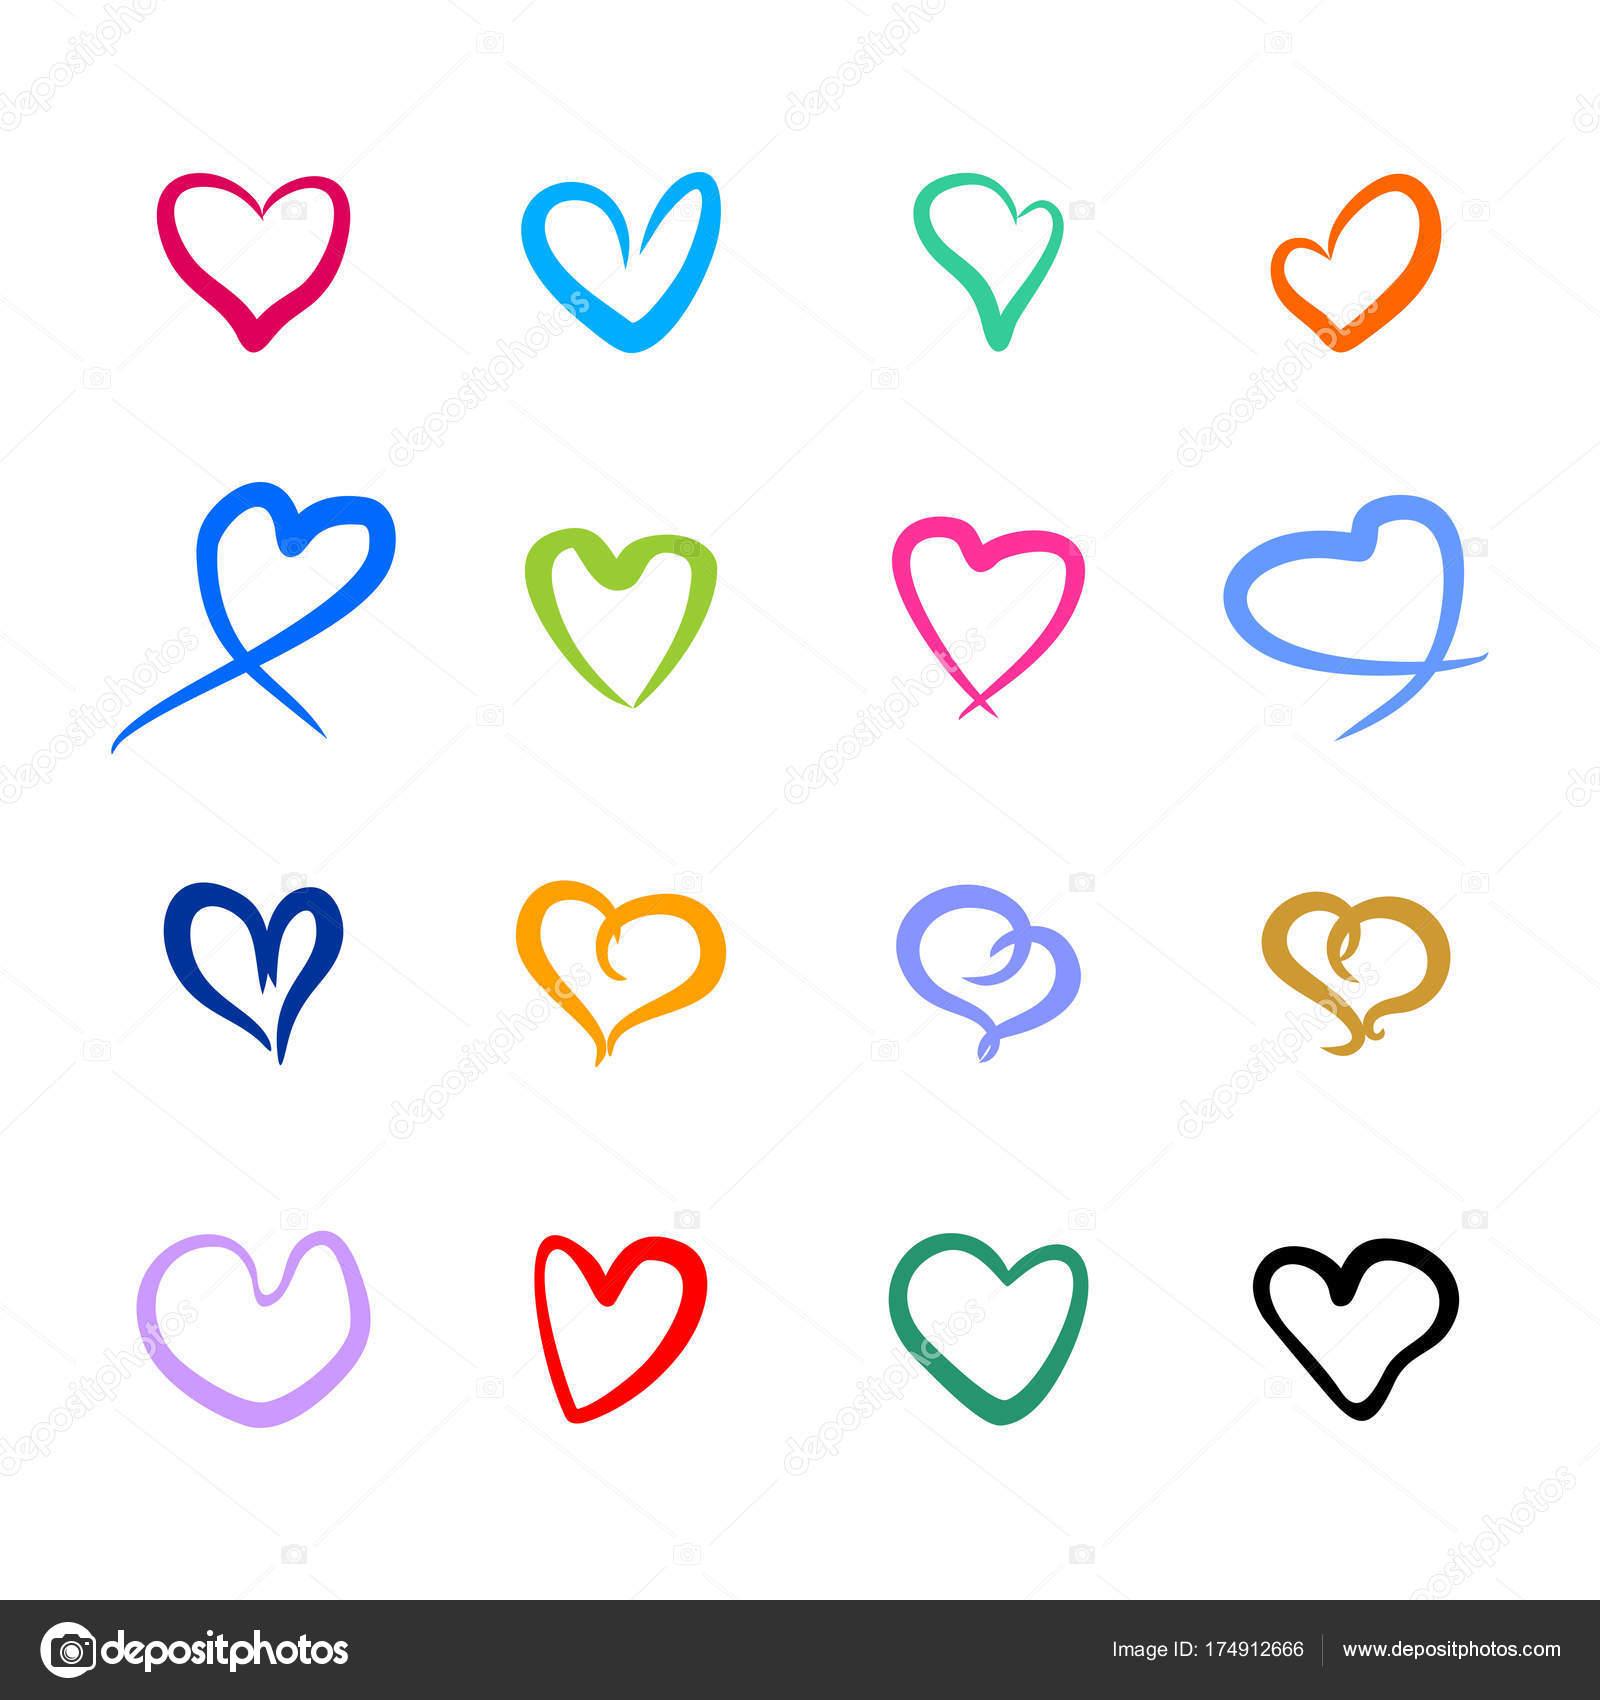 Set Vector Hearts Symbols Love Stock Vector Ymoiseeva 174912666